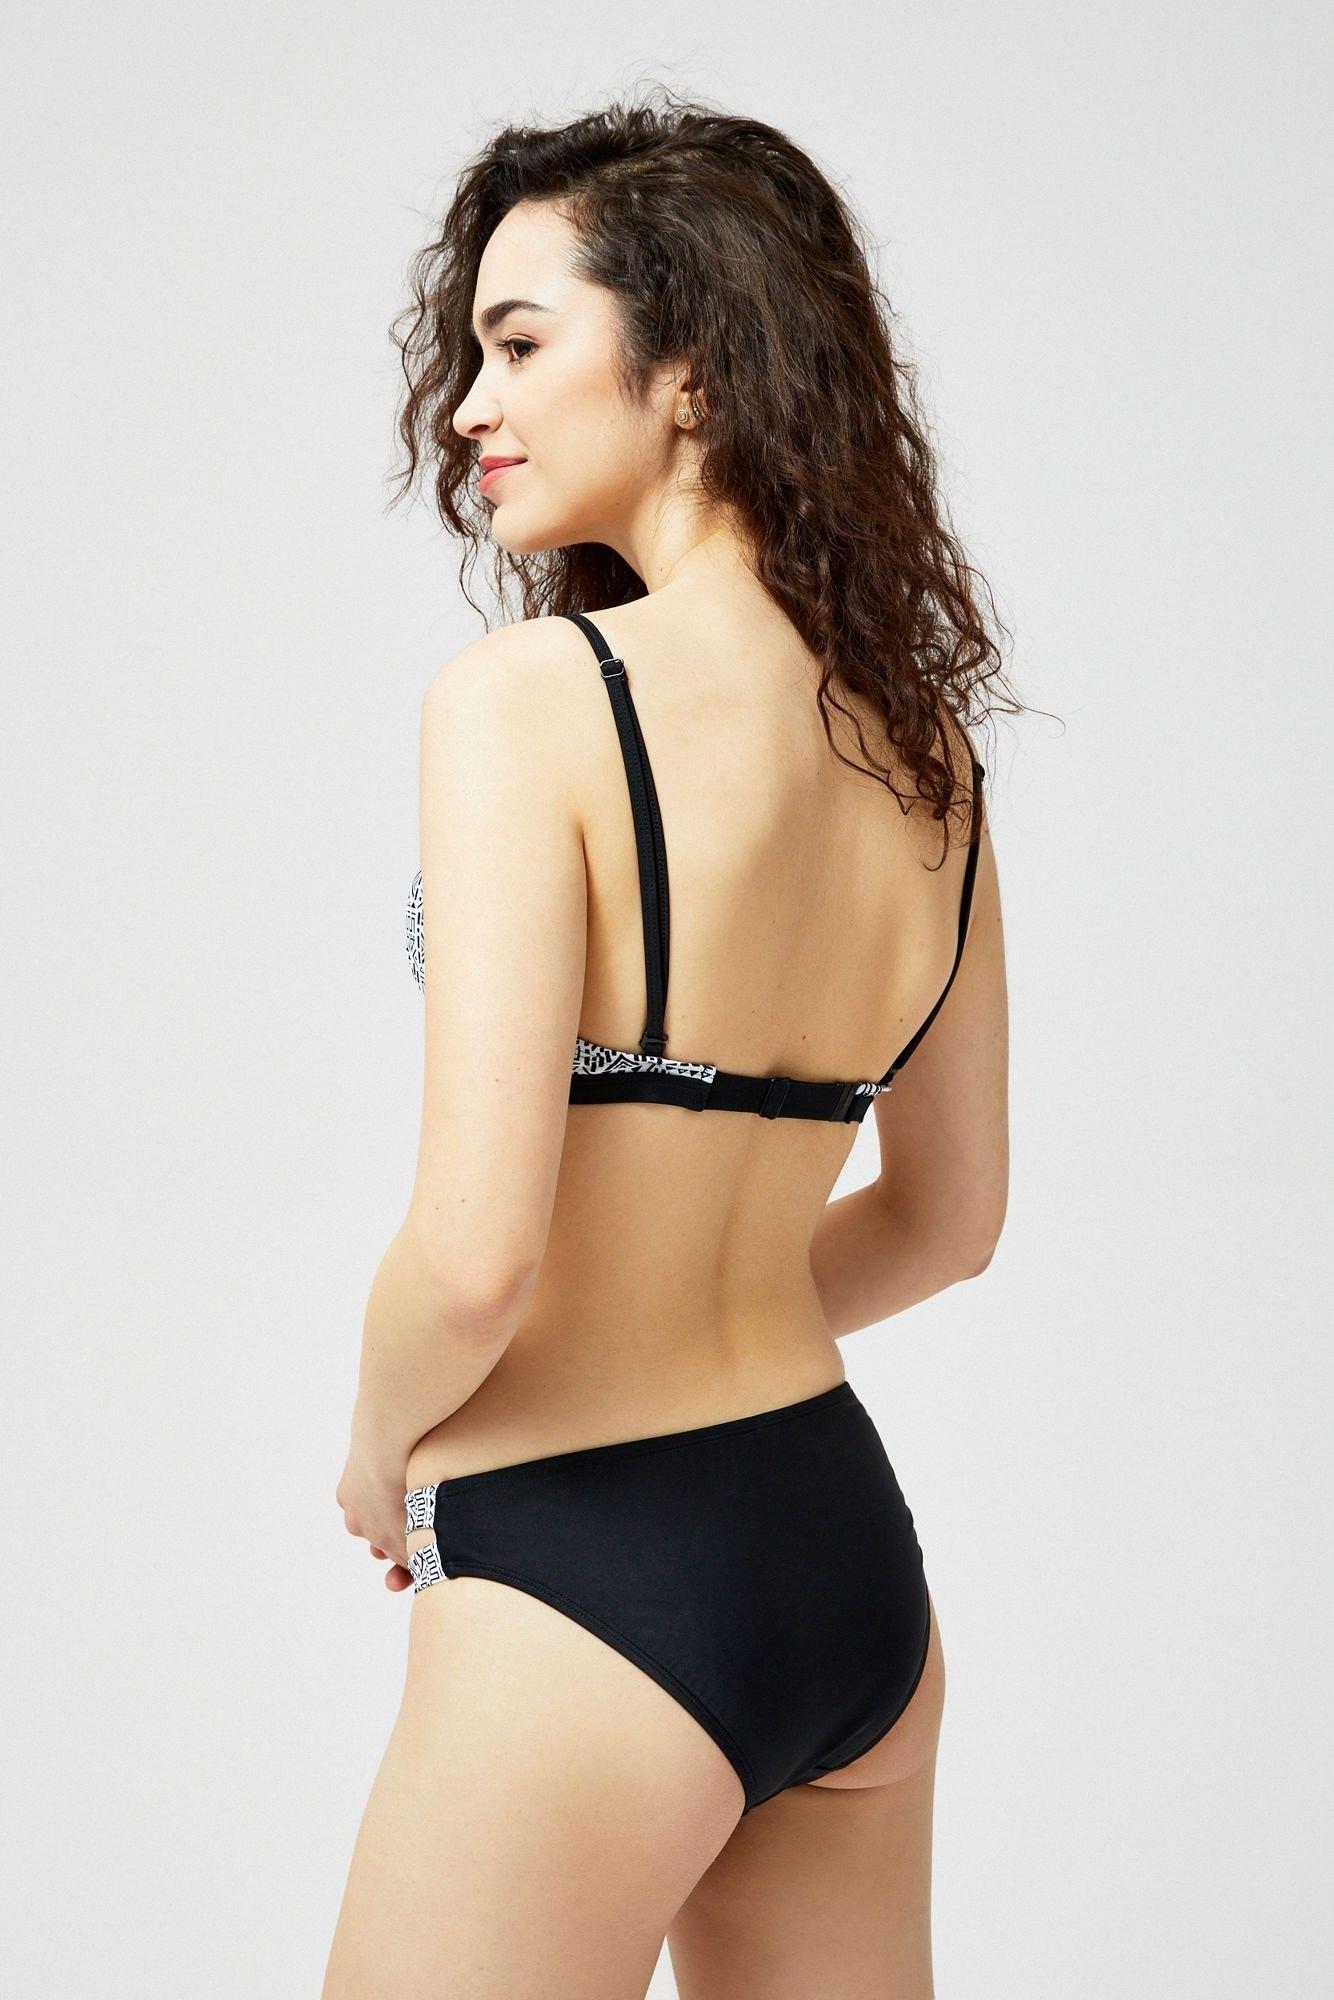 Góra od bikini